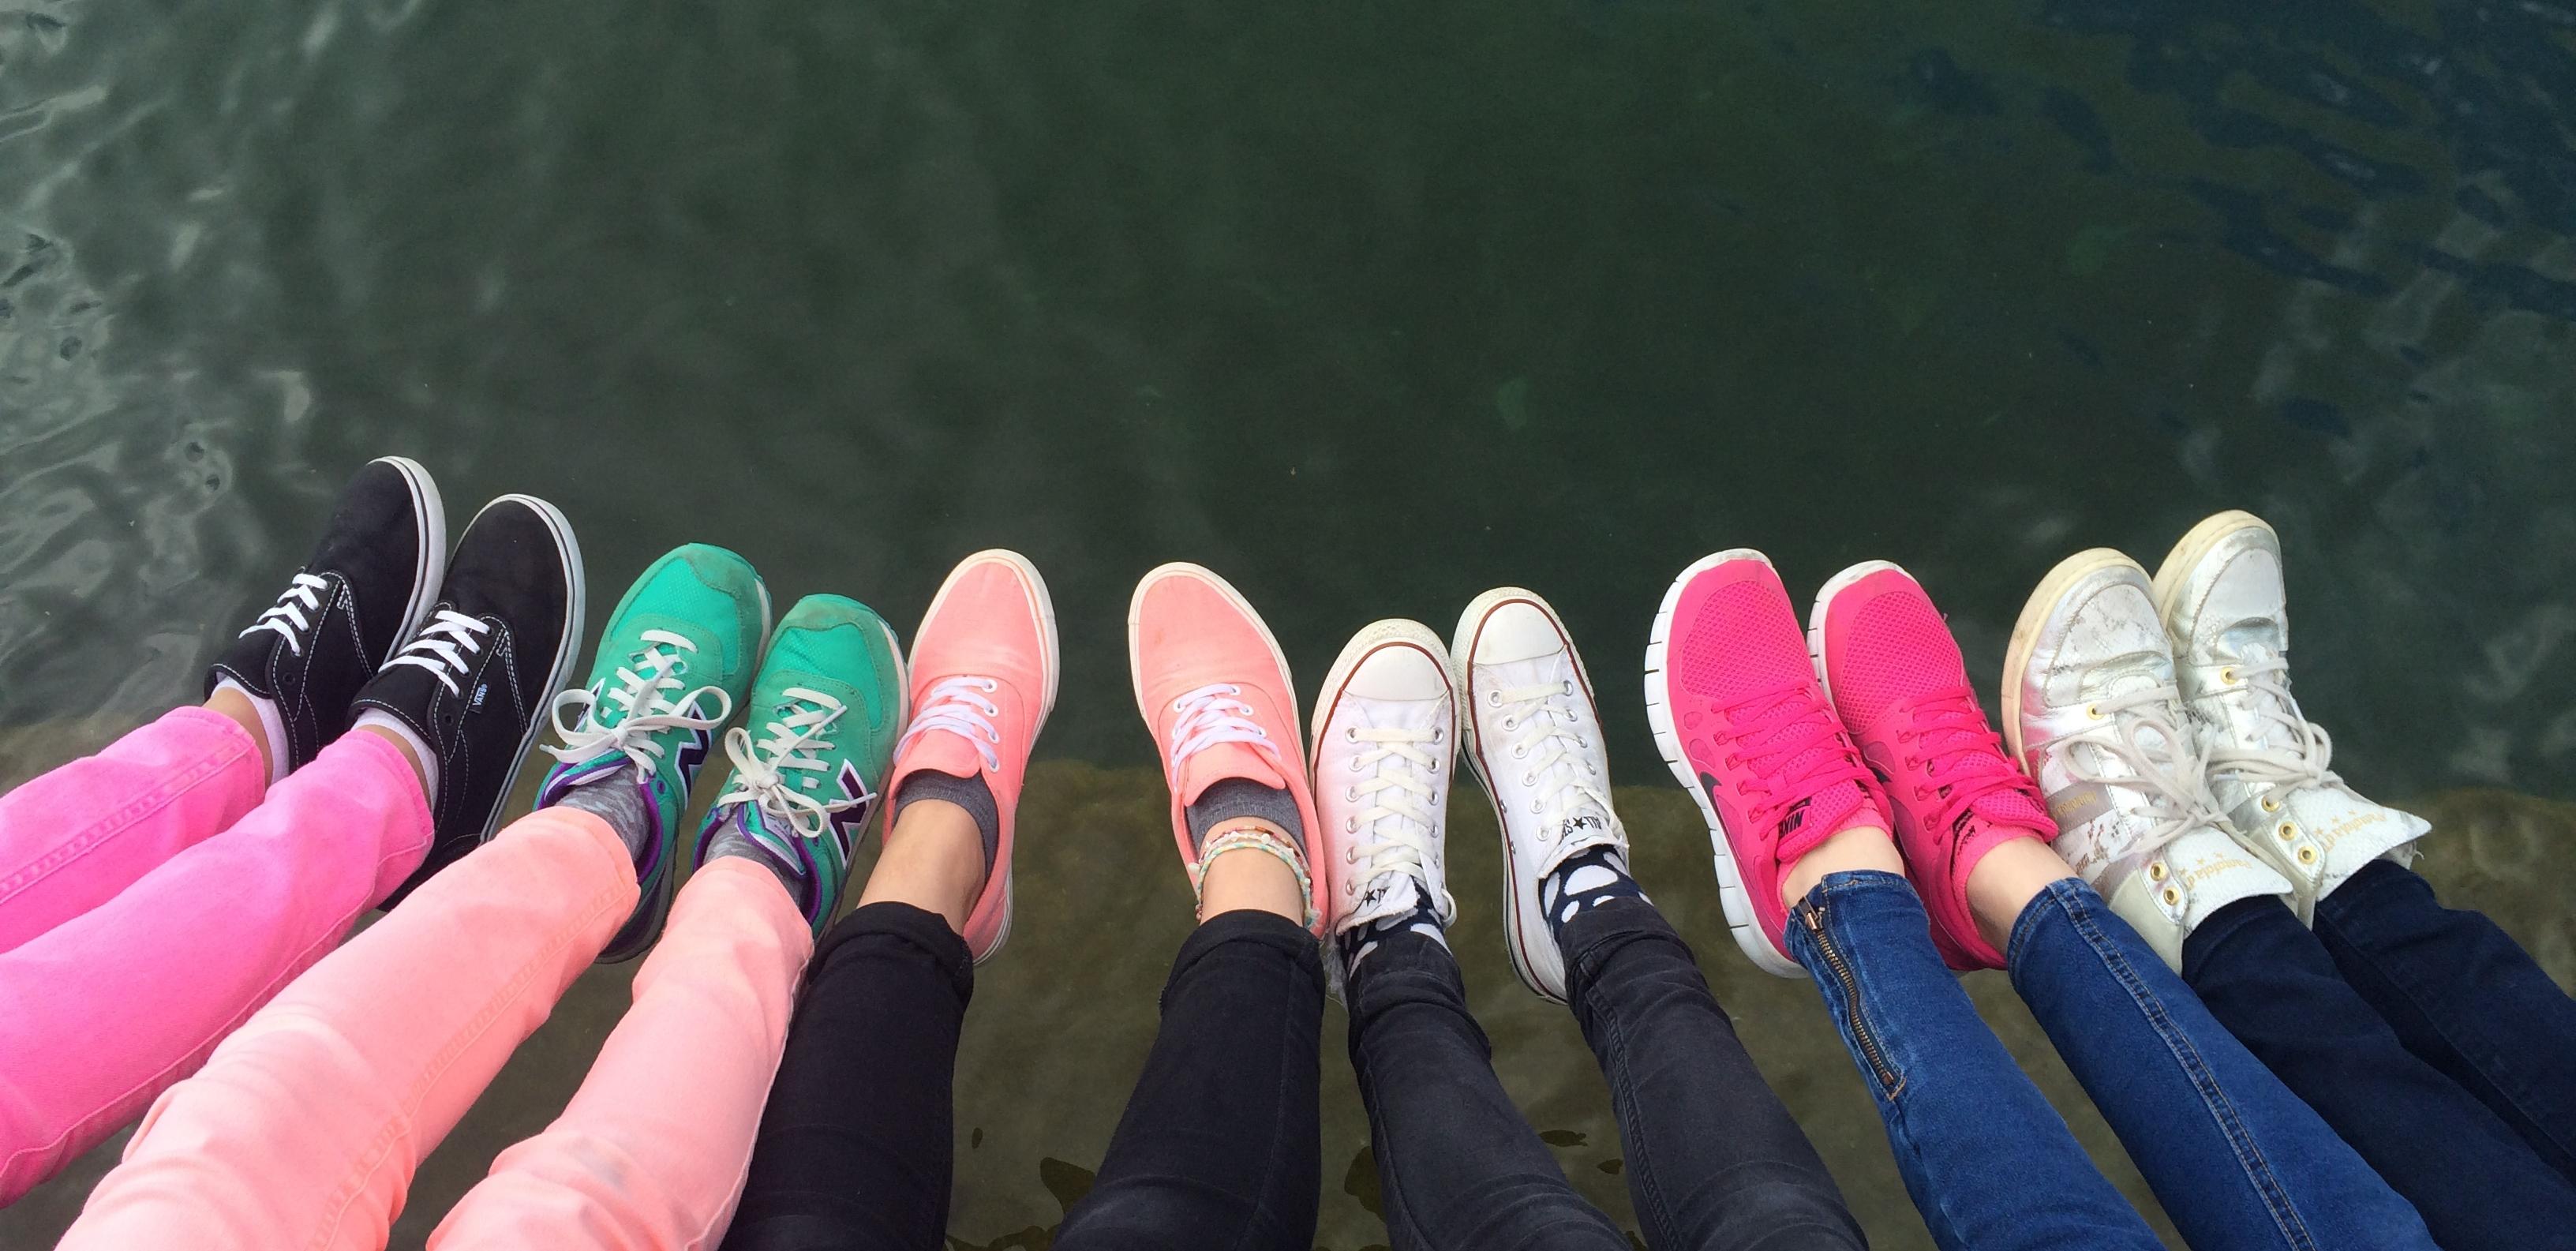 Sneakers_over_water